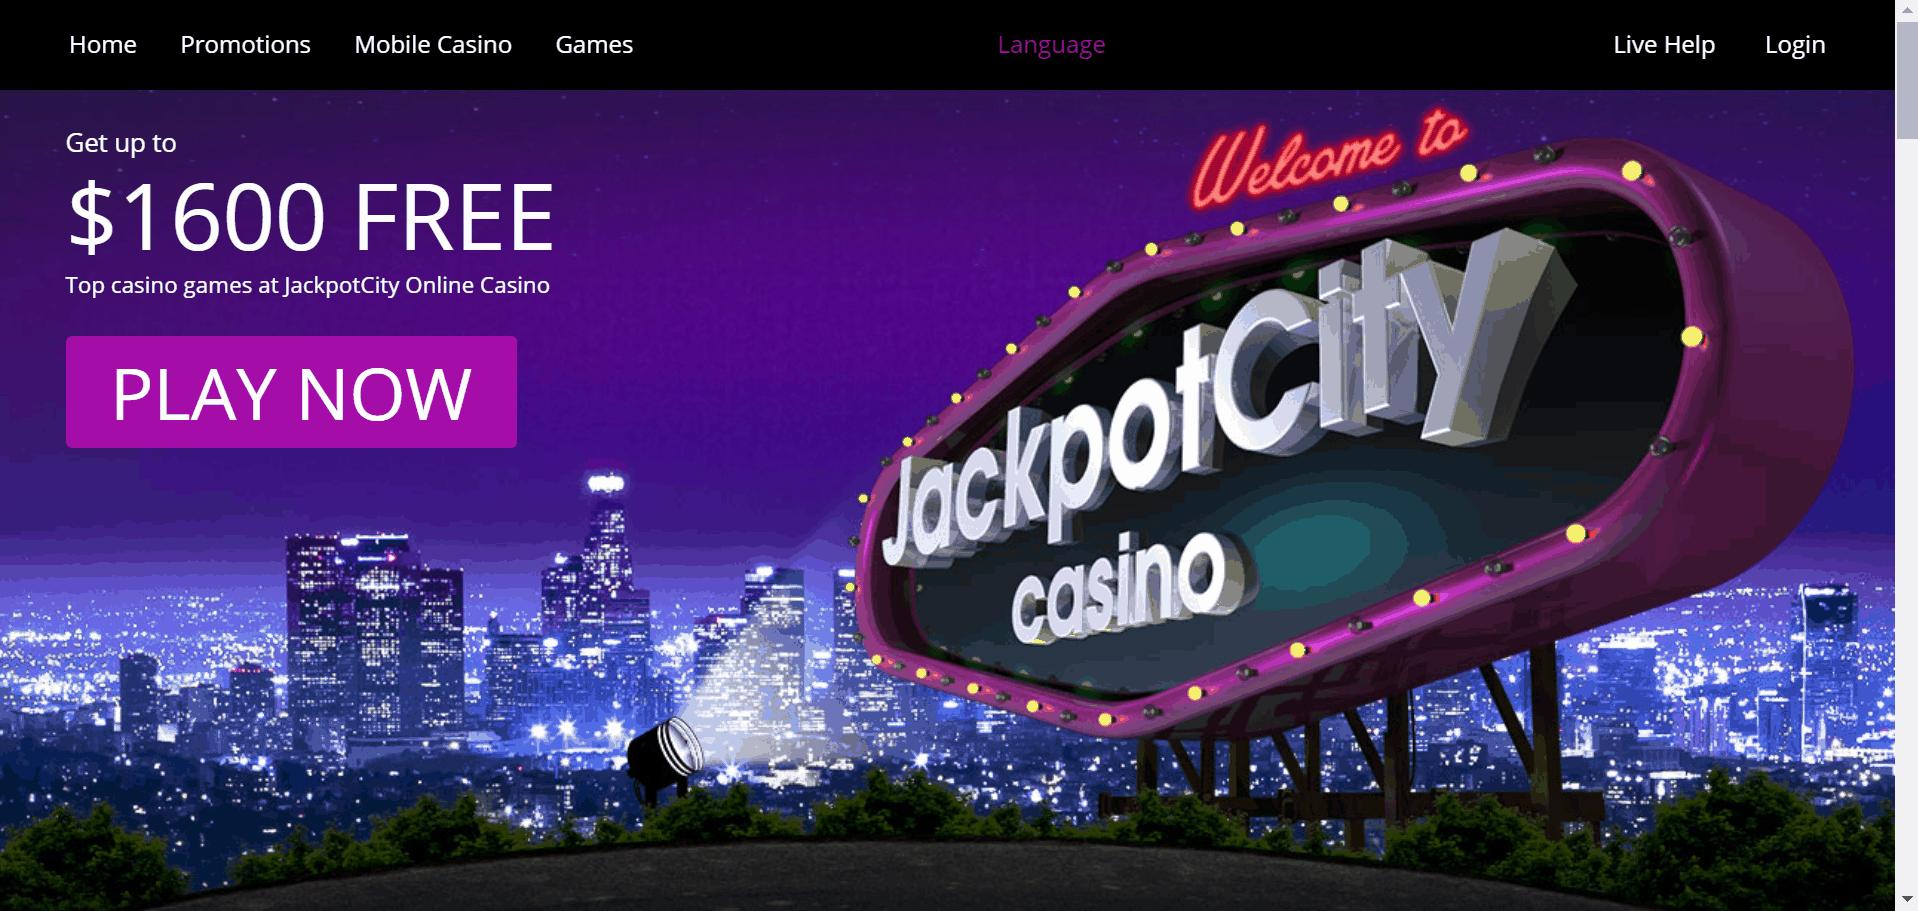 JackpotCity Casino desktop